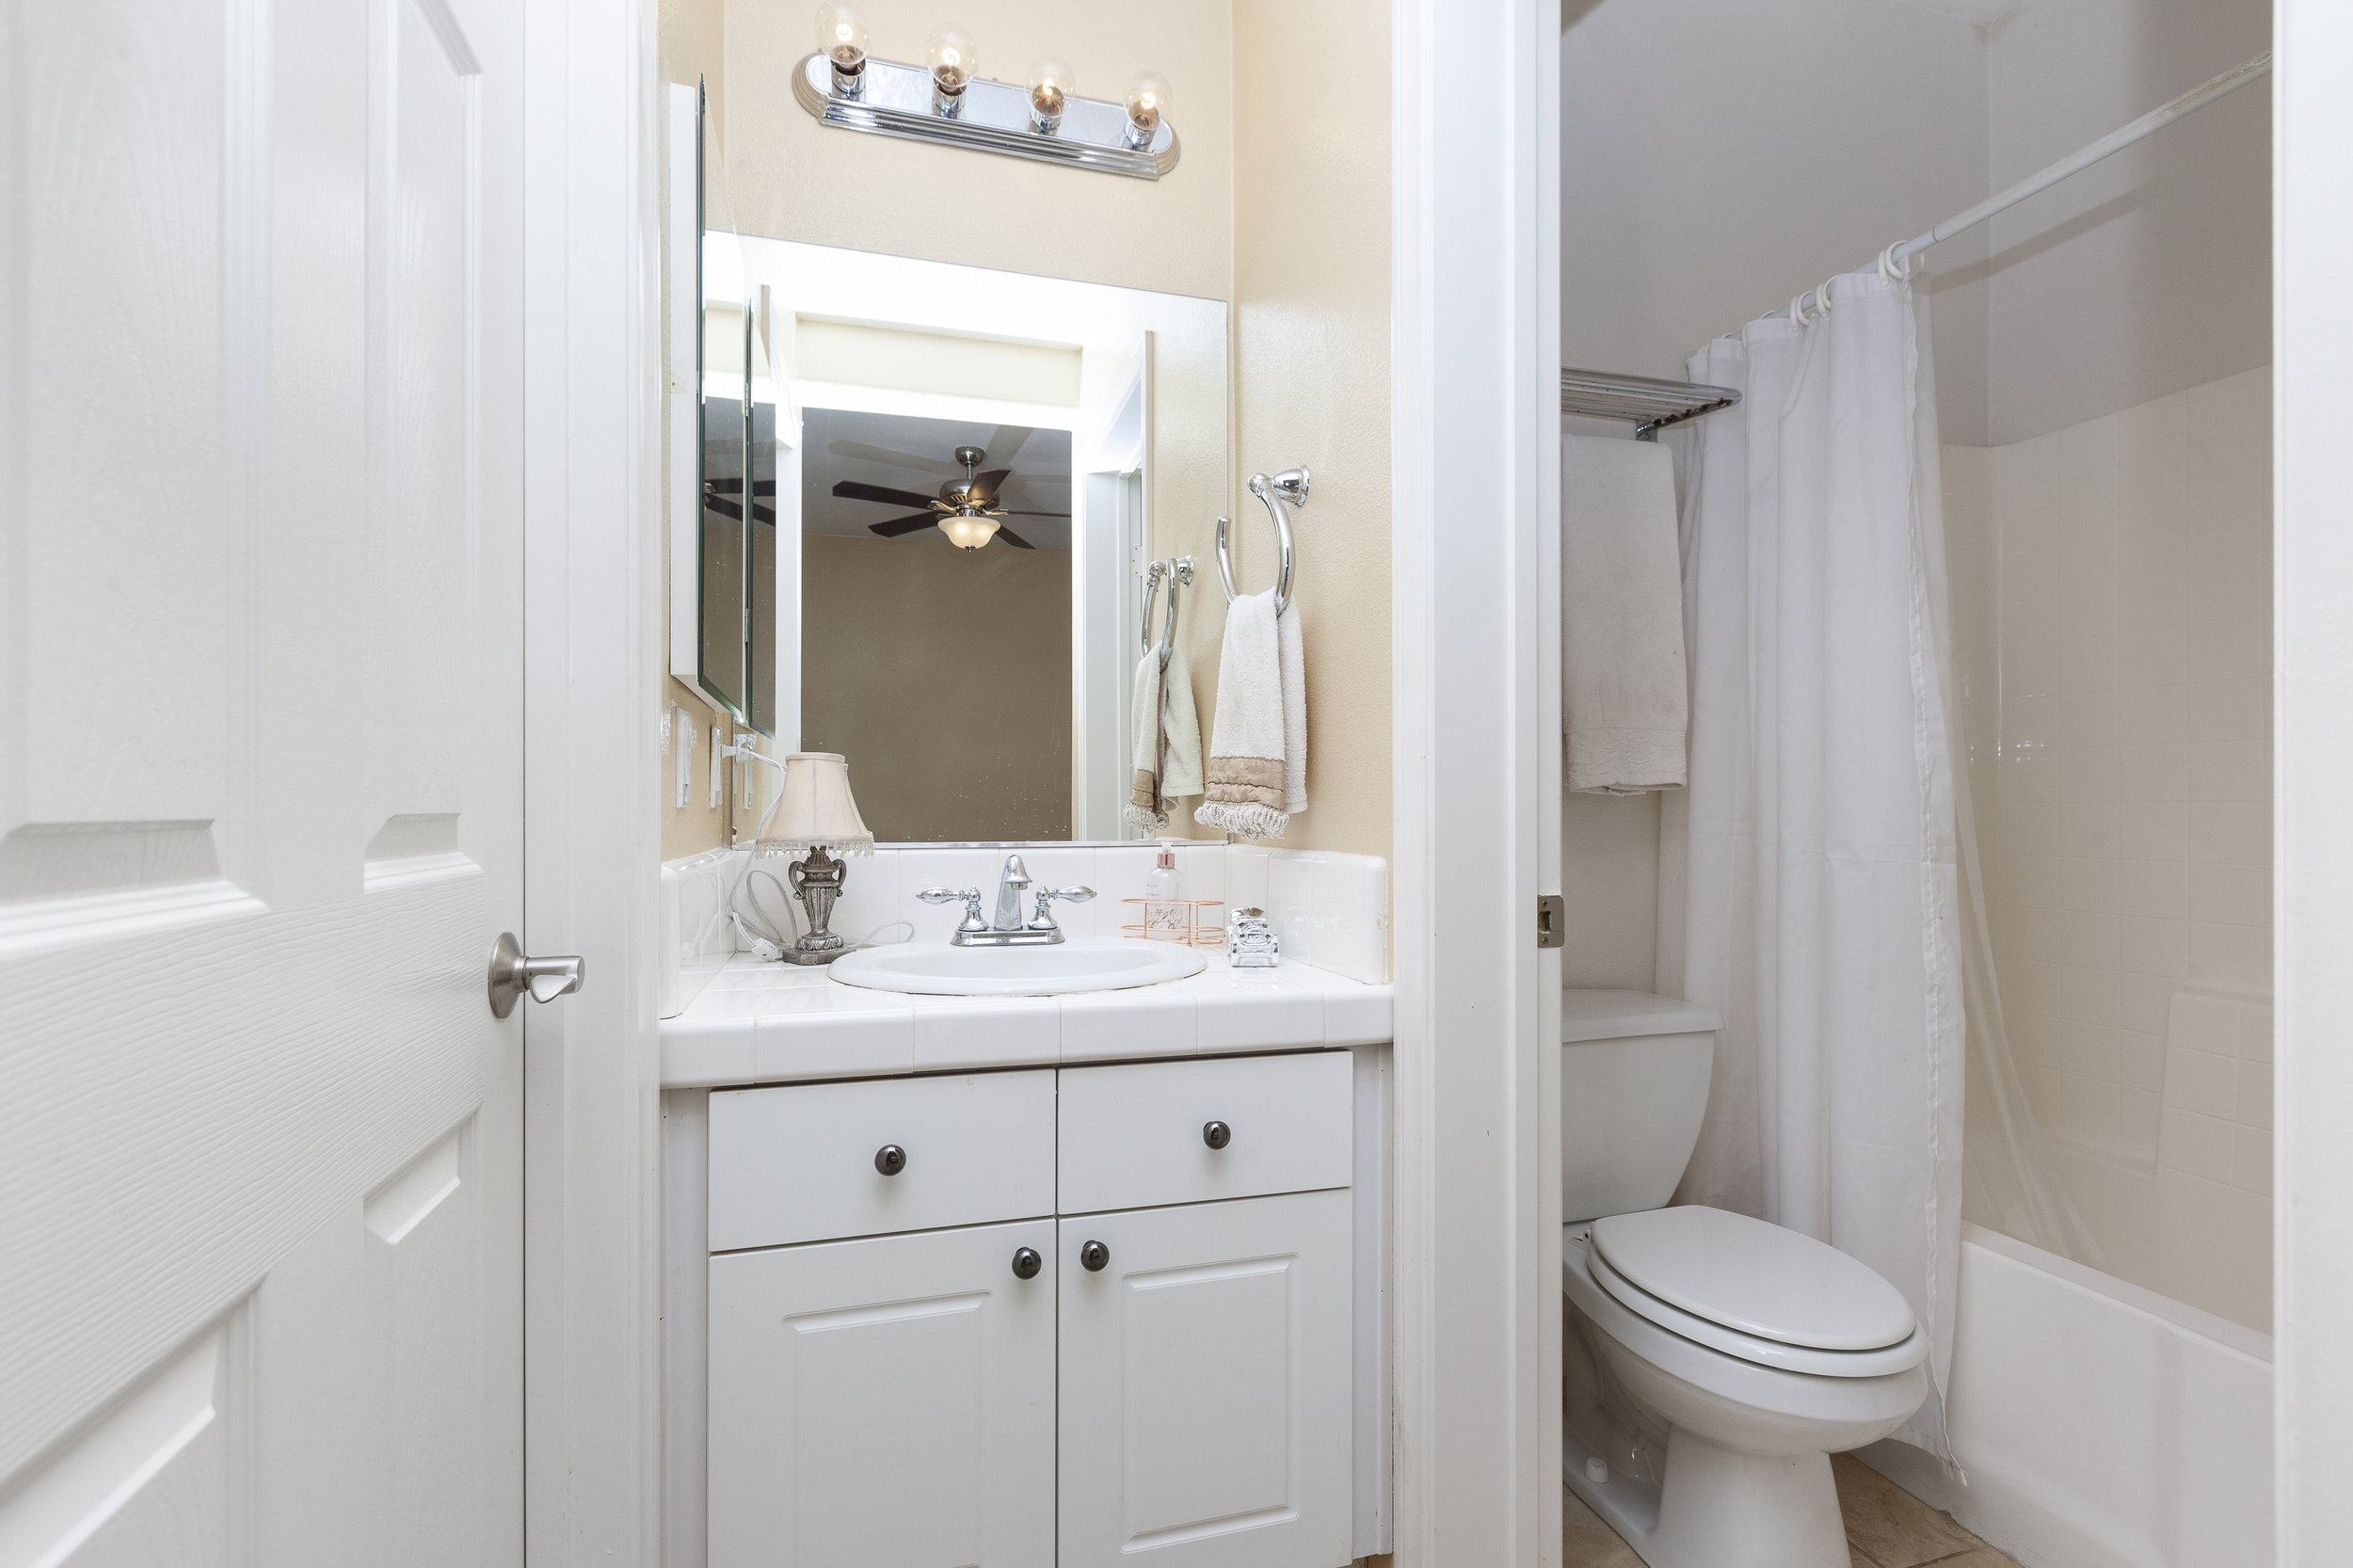 021_Bathroom .jpg